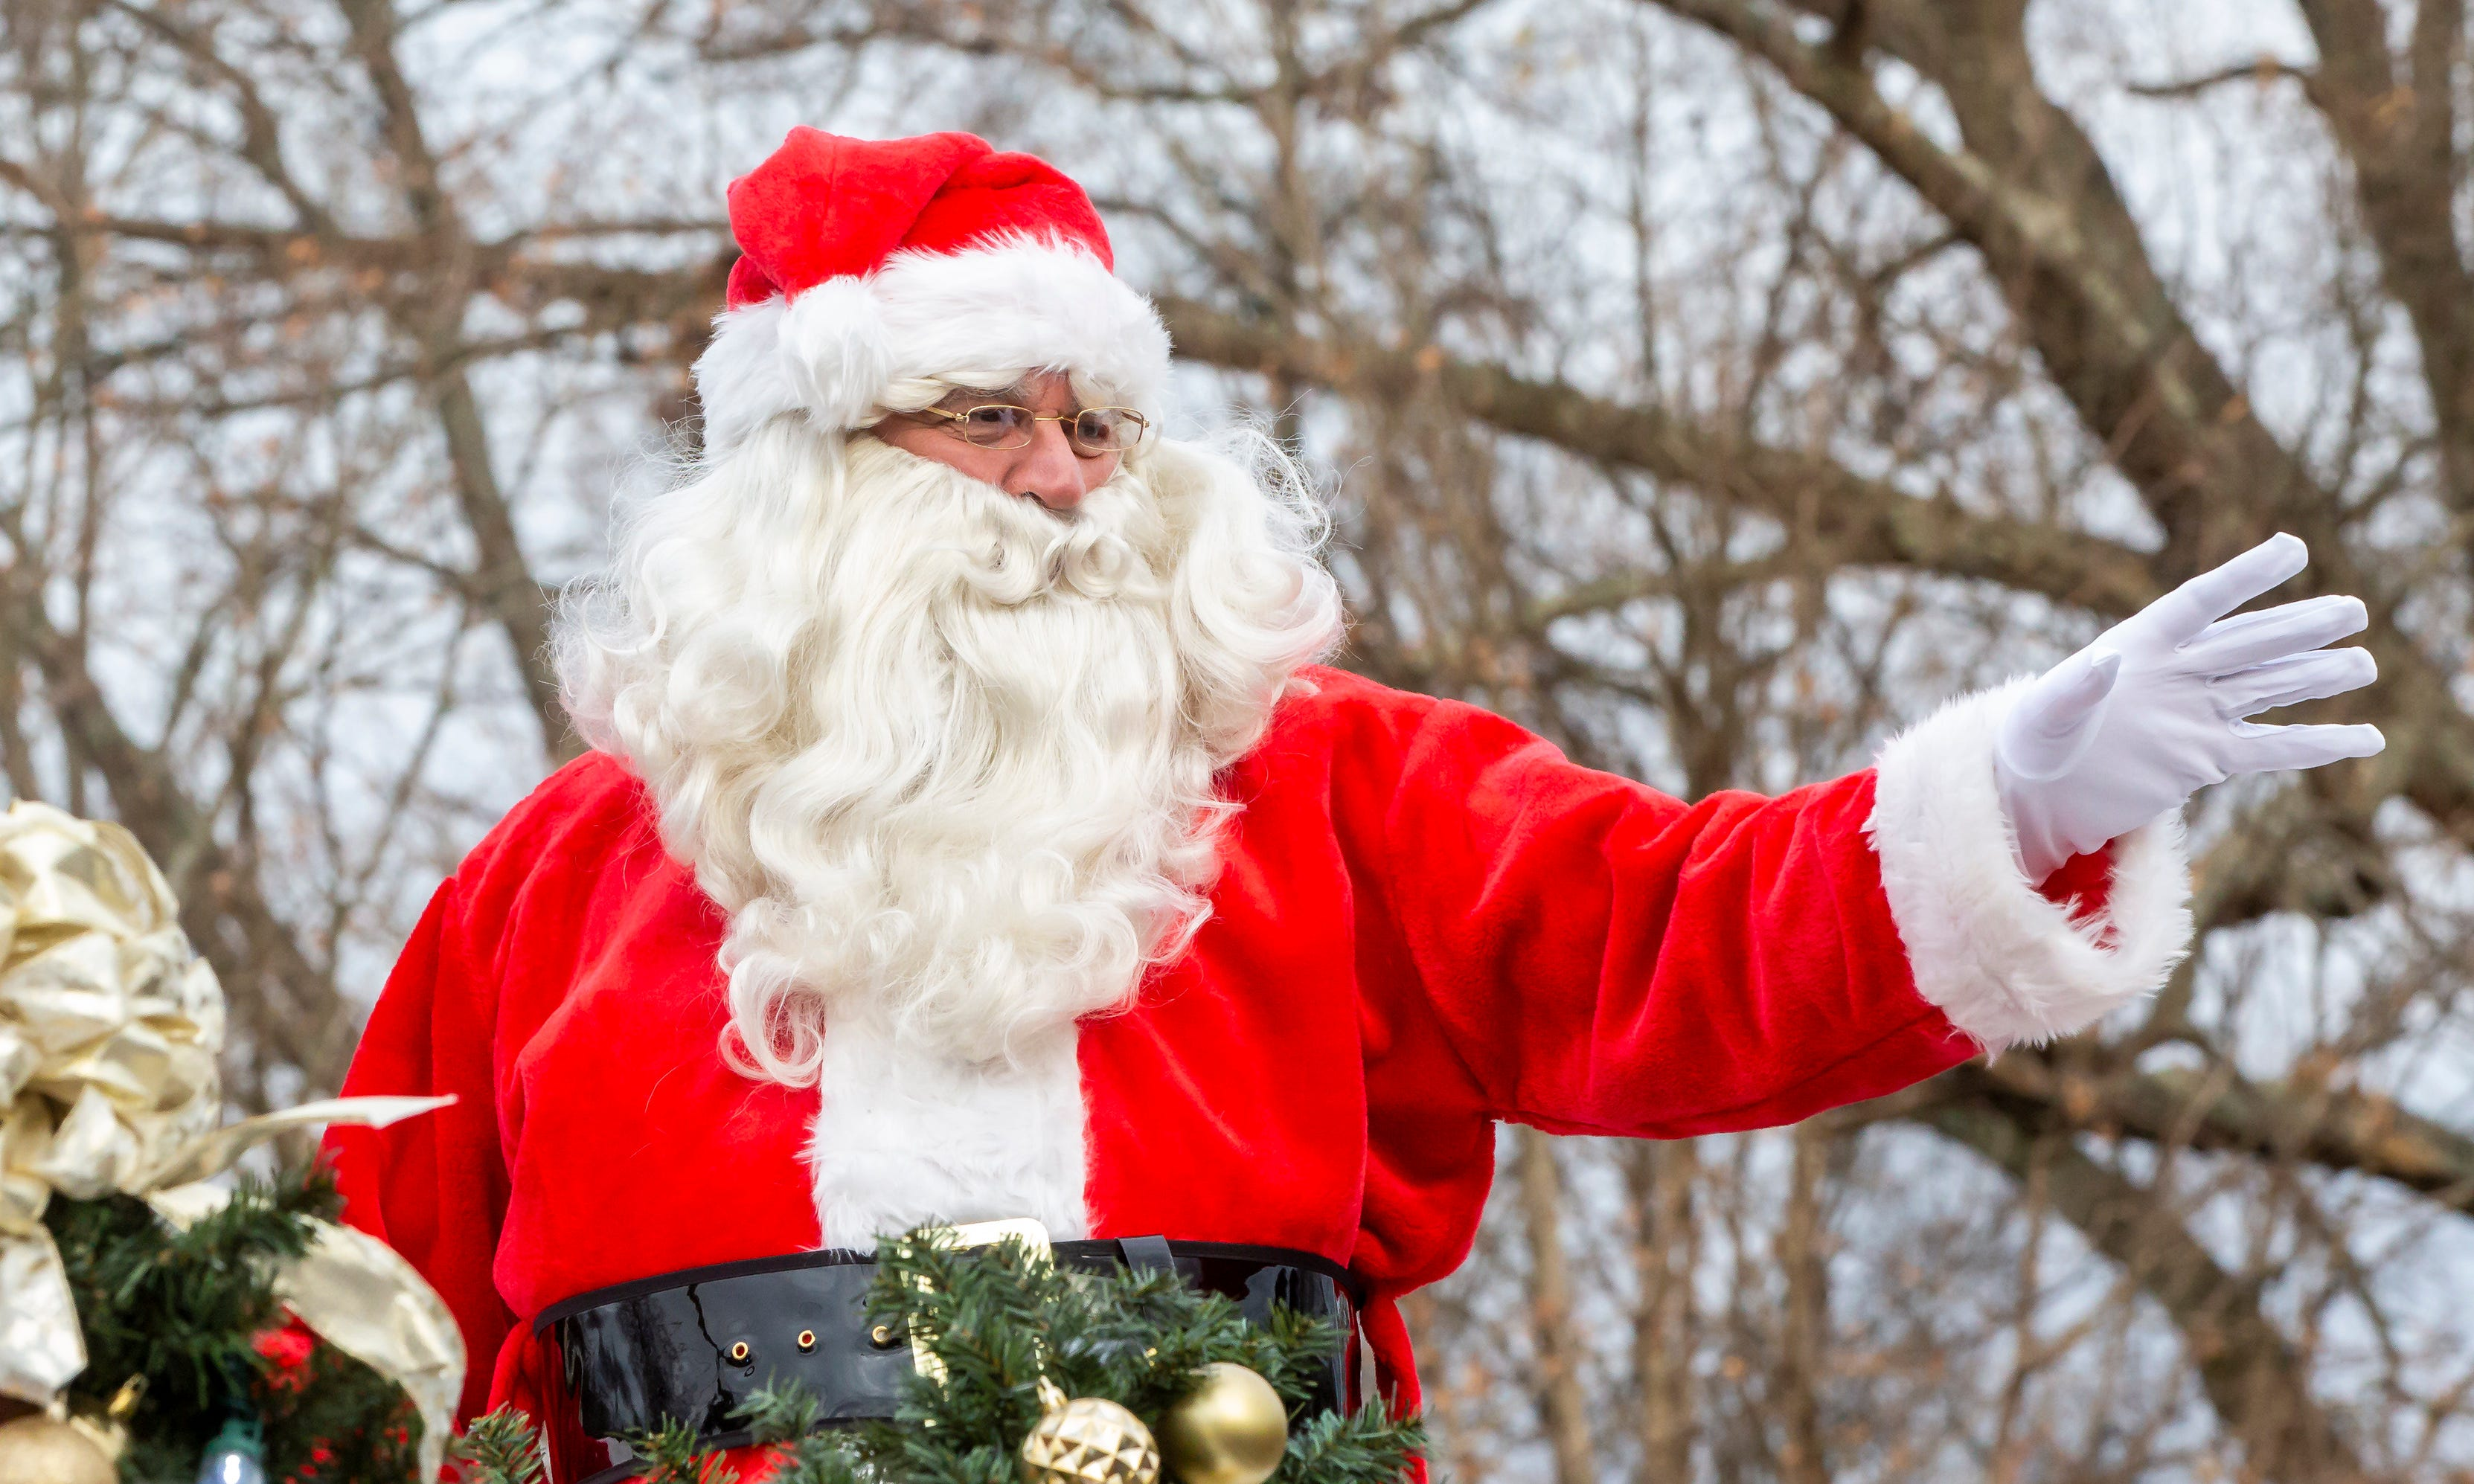 Walker Christmas Parade 2021 City Taking The Helm Of Murfreesboro Christmas Parade